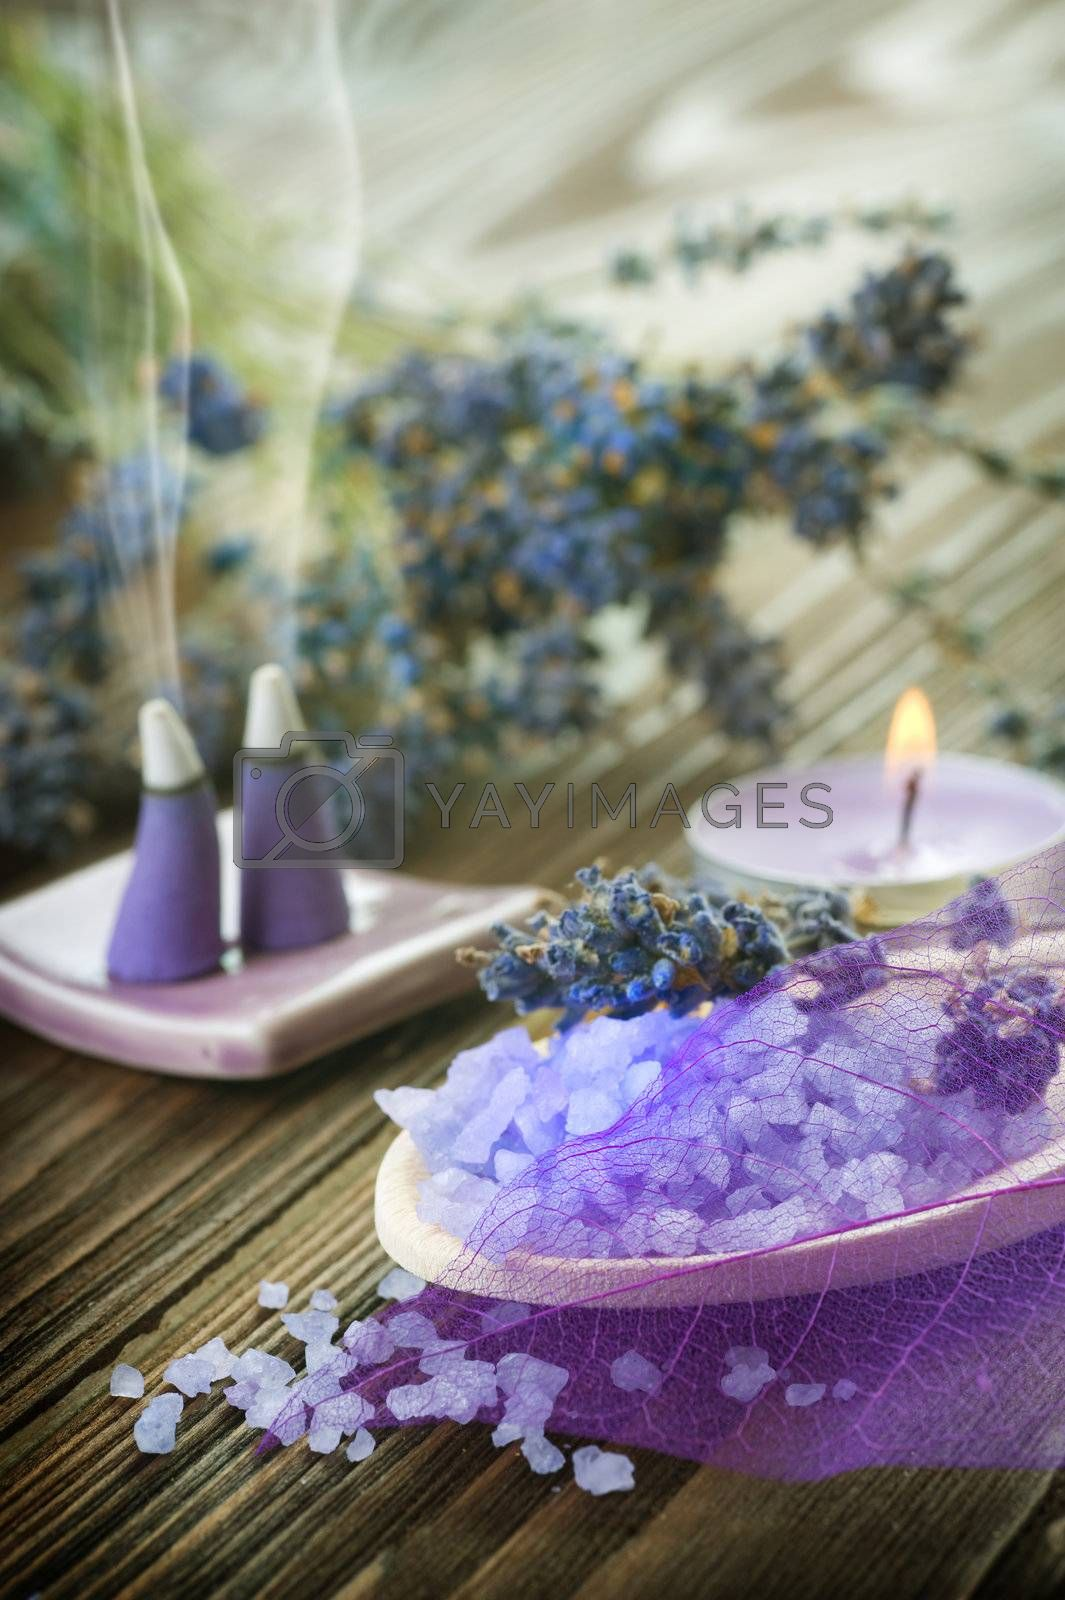 Aromatherapy. Lavender Spa by Subbotina Anna